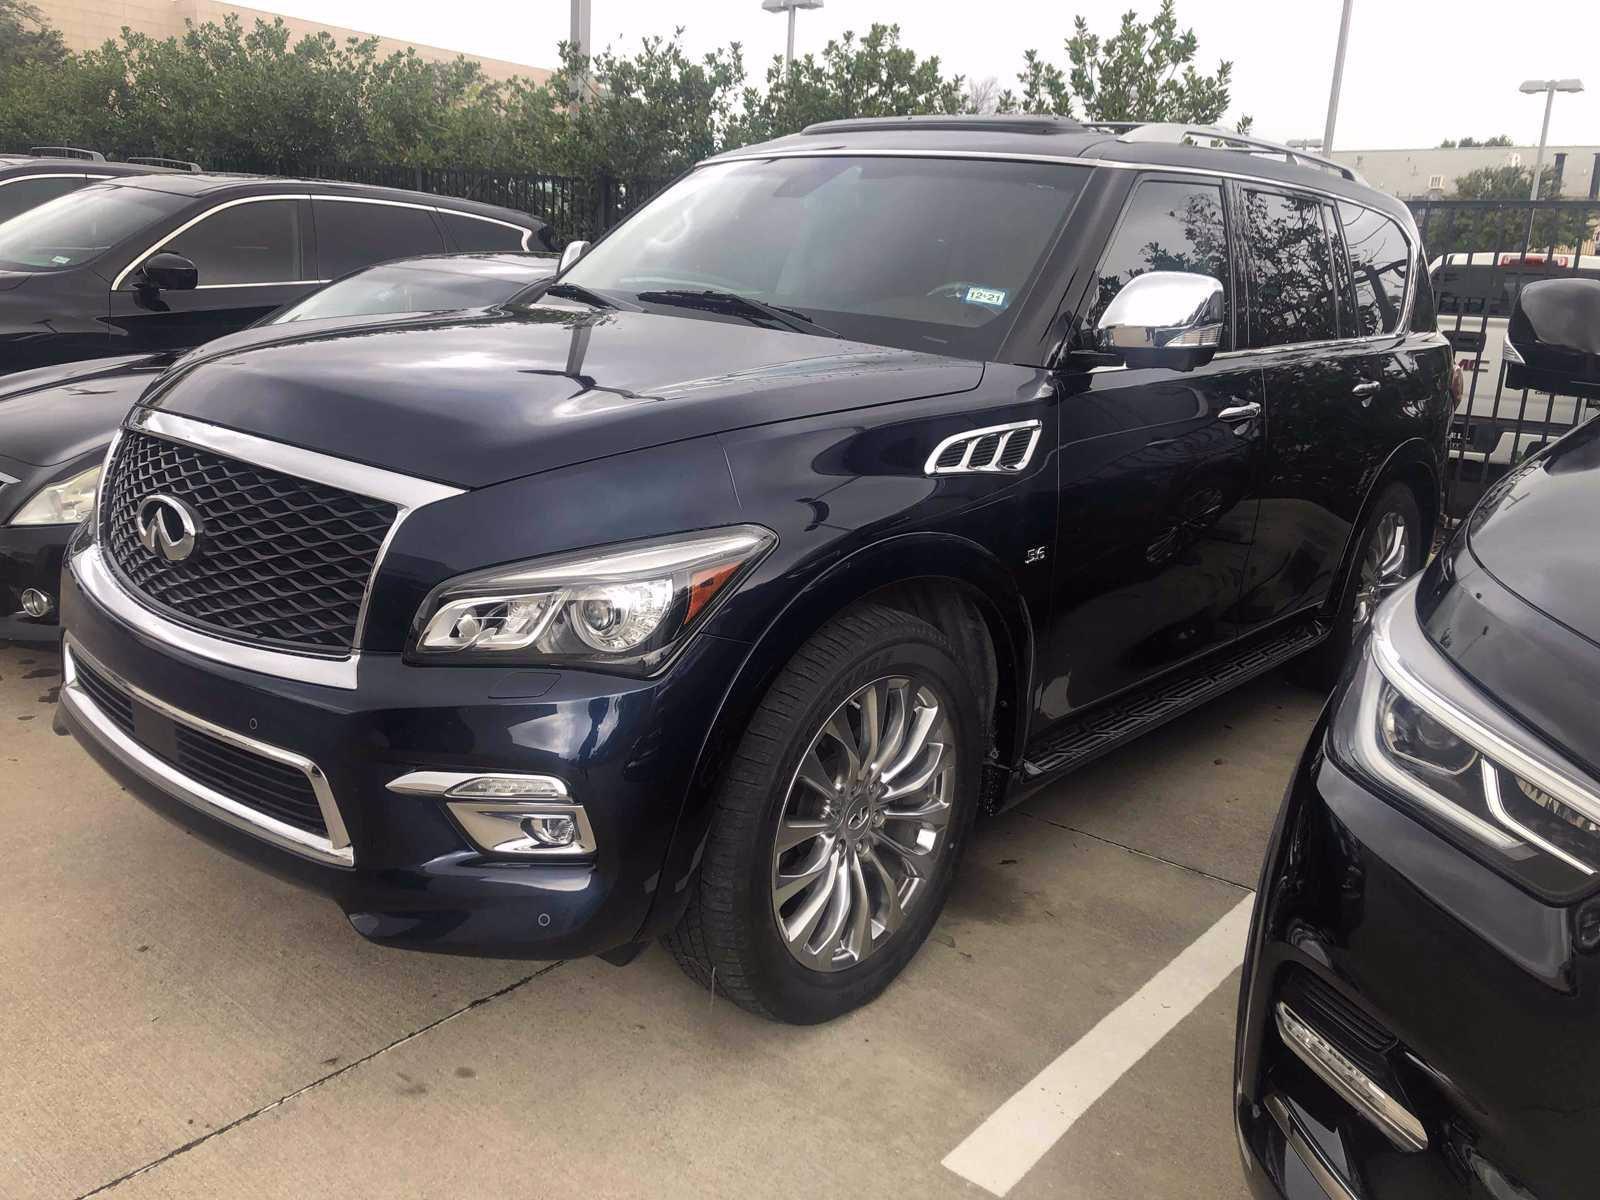 2017 INFINITI QX80 Vehicle Photo in Fort Worth, TX 76132